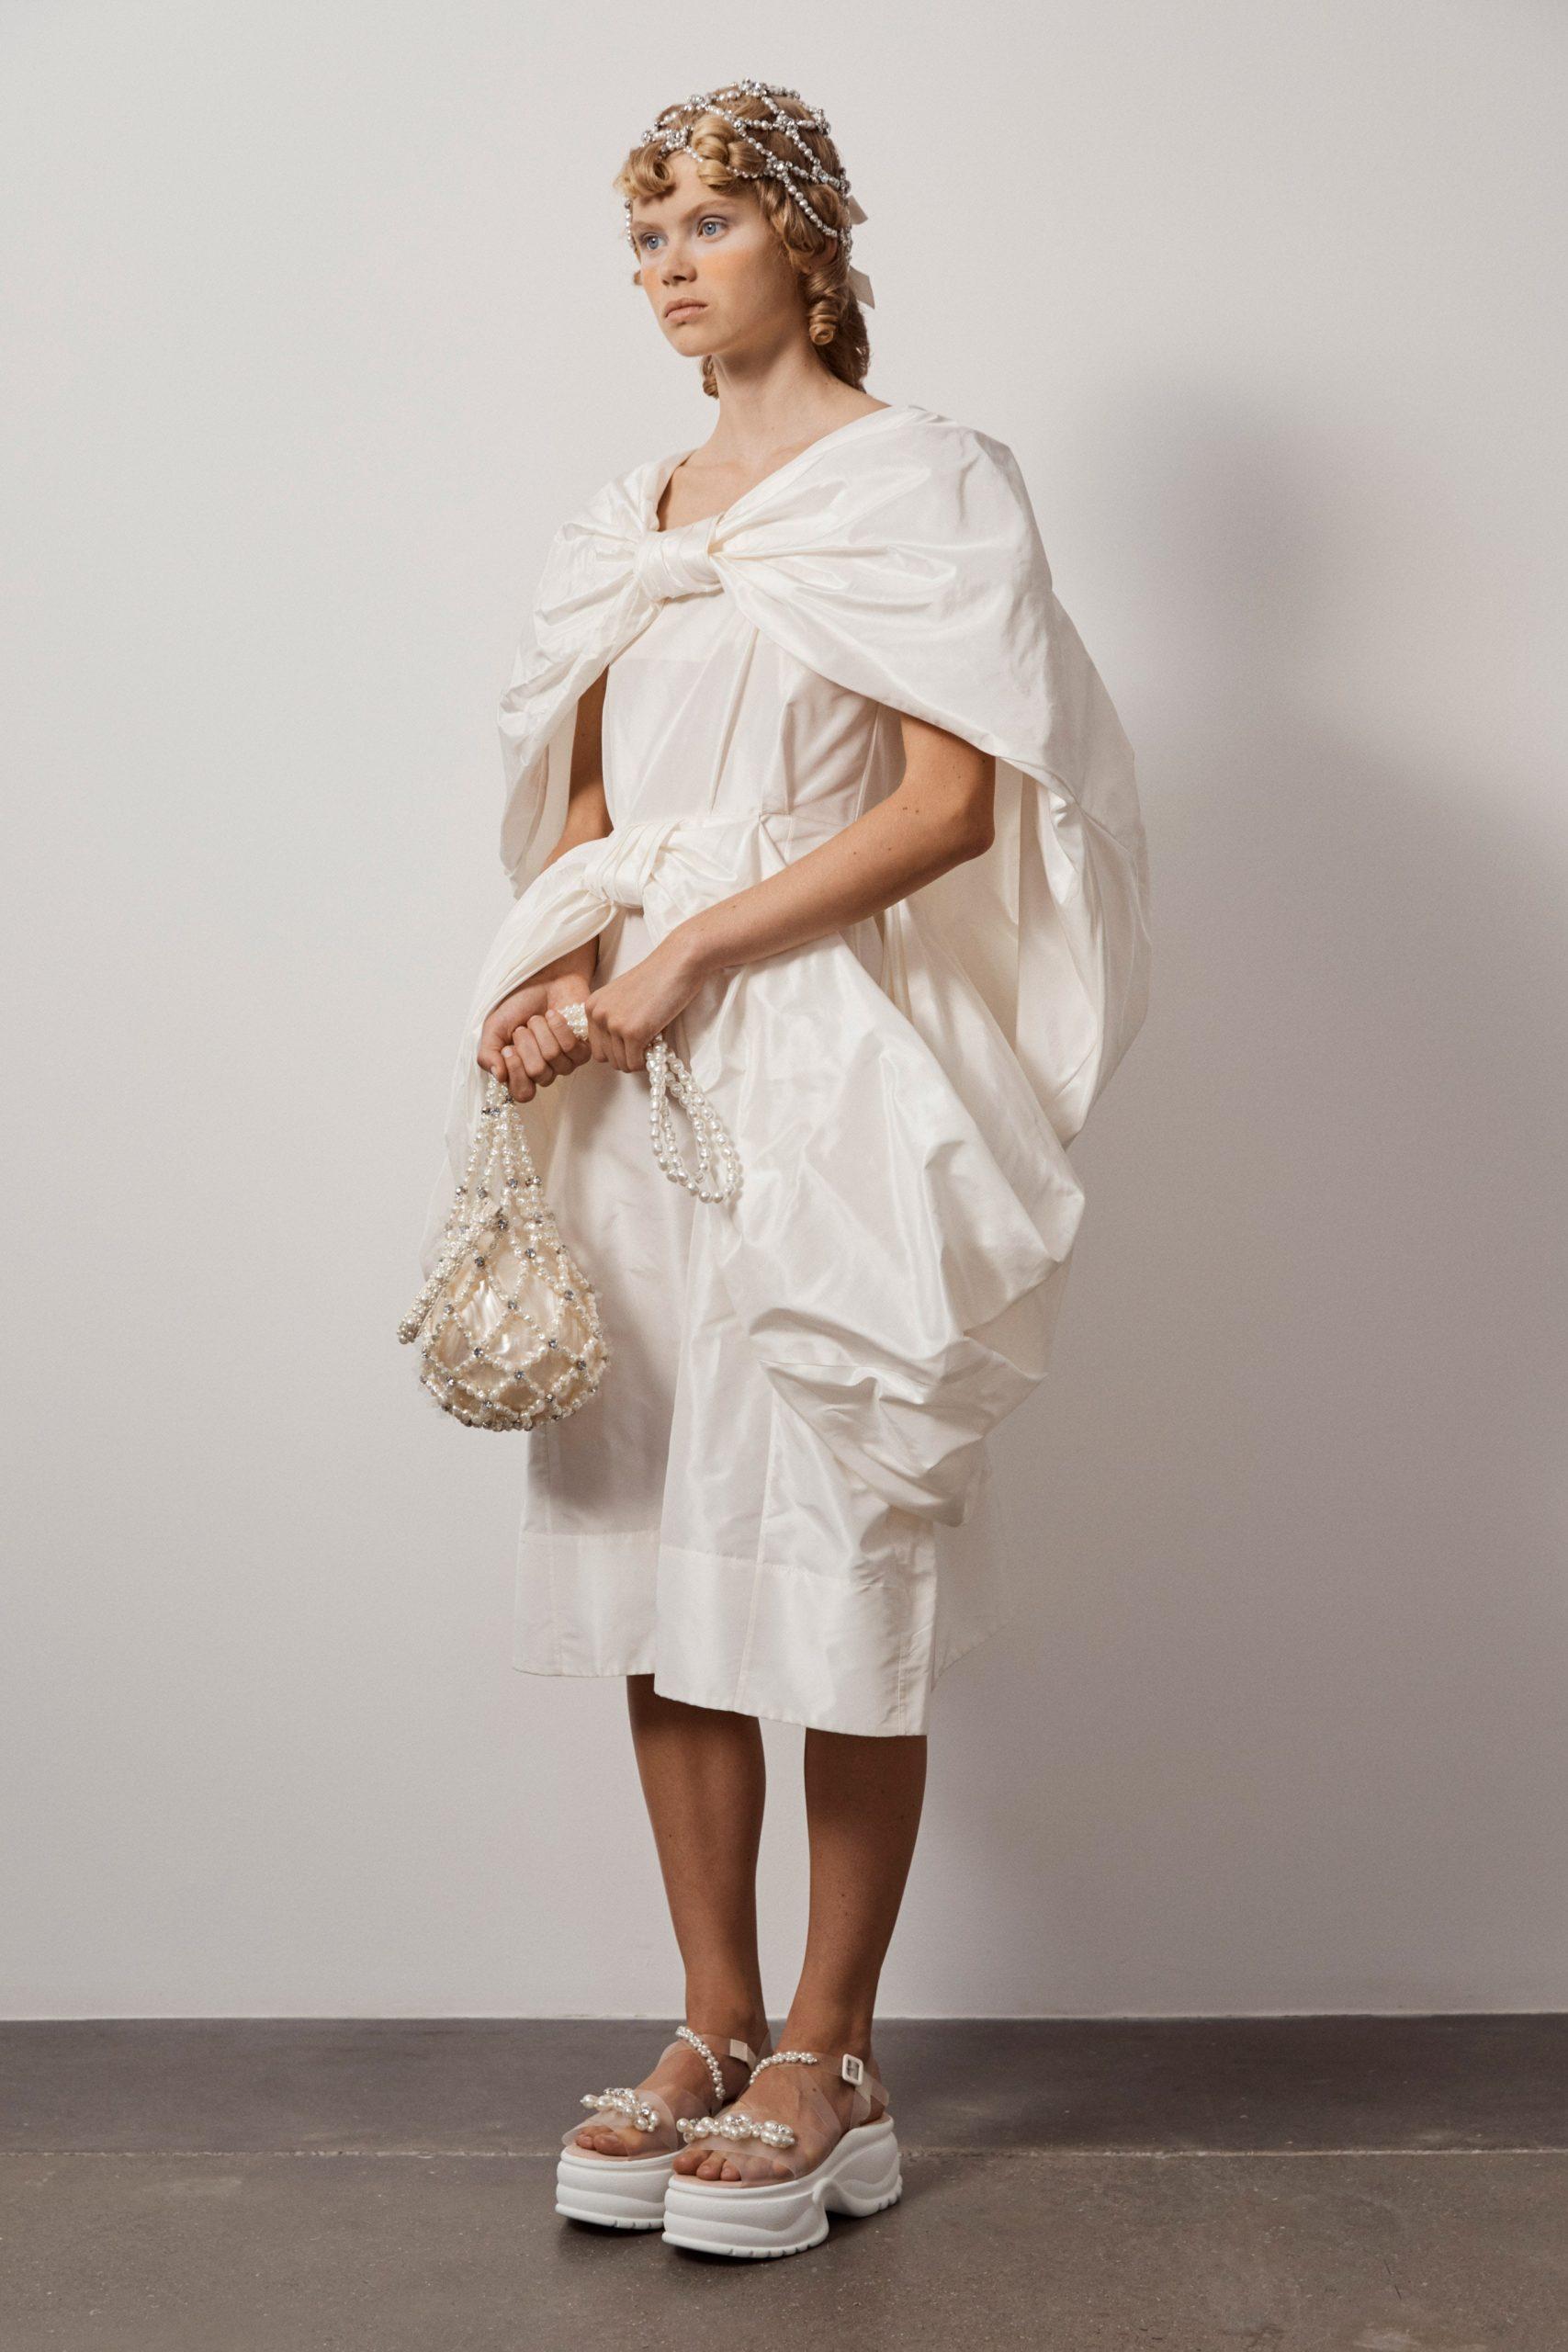 Simone Rocha Spring 2021, vestidos de novia 2021 Simone Rocha - Wedding Hub - 07